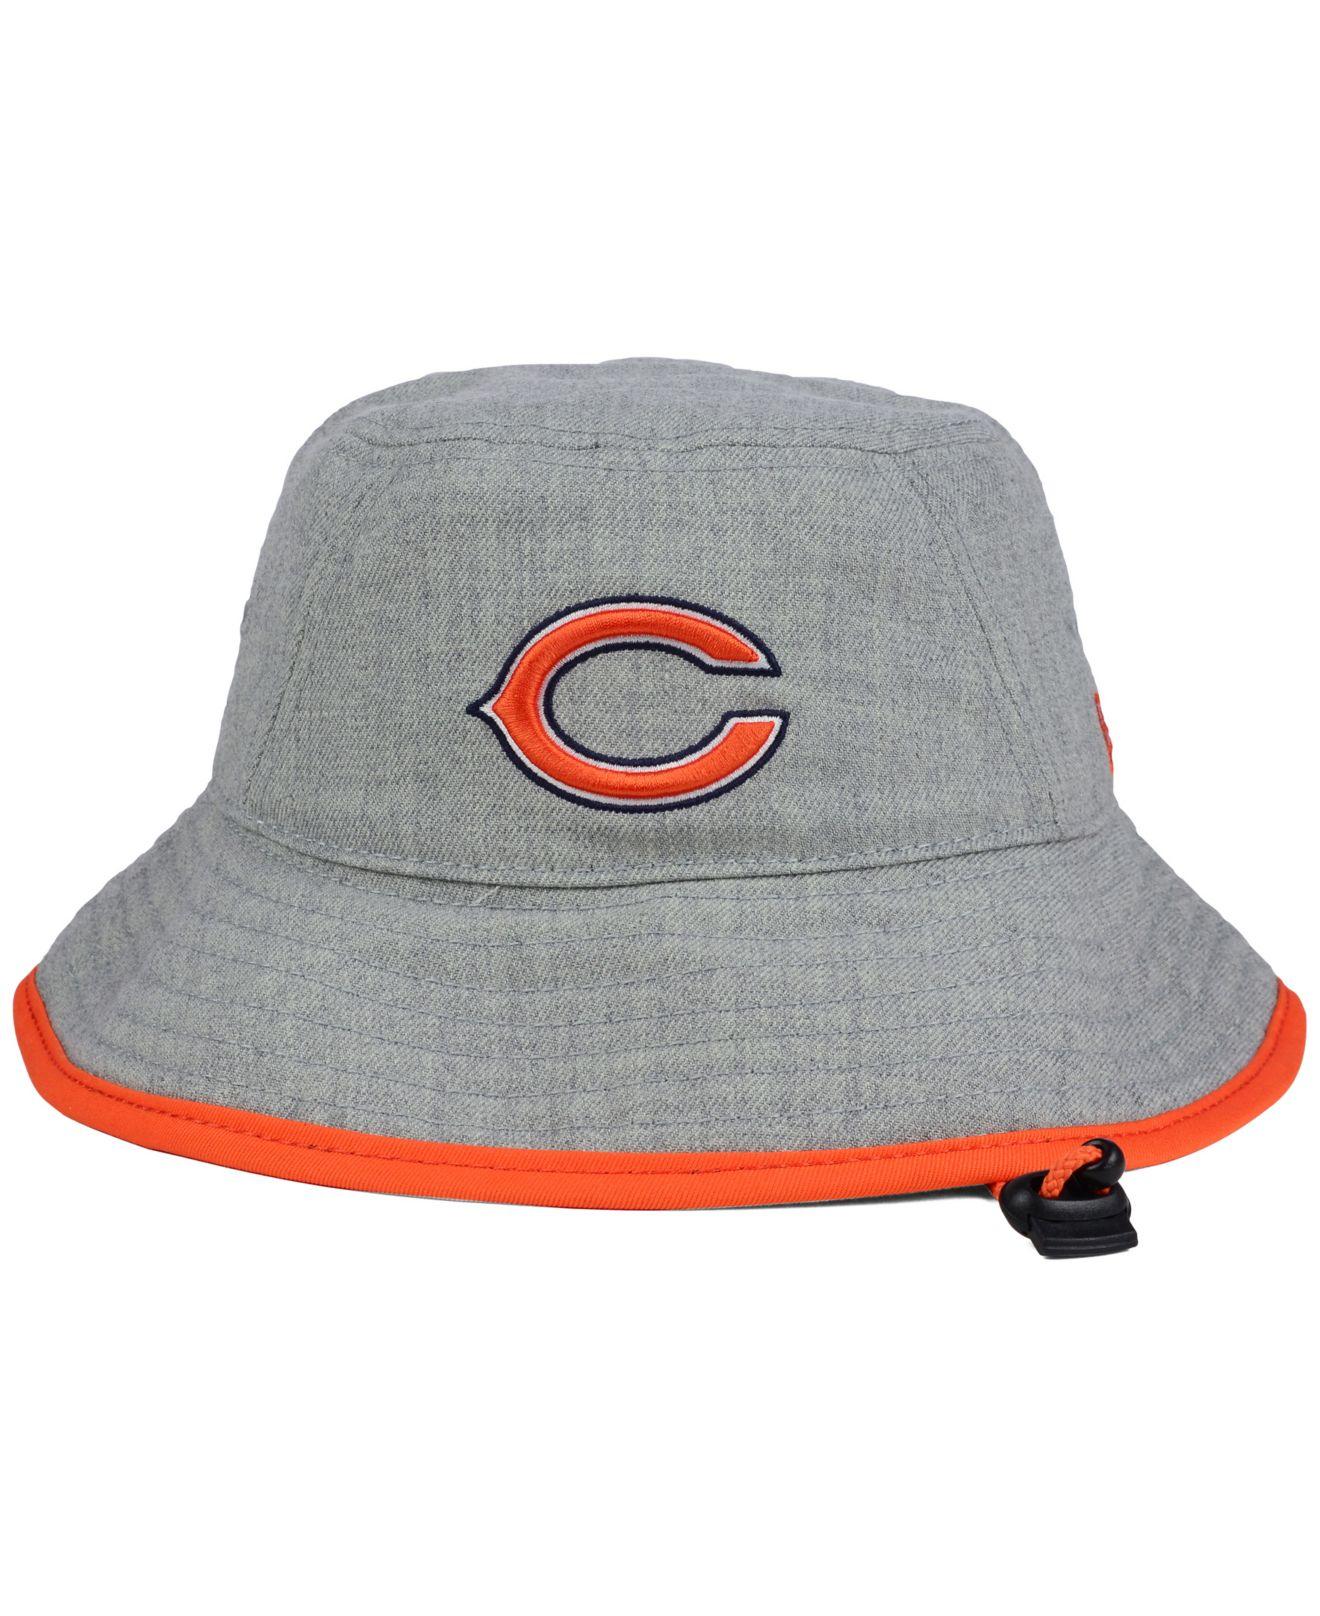 8ca15987e KTZ Chicago Bears Nfl Heather Gray Bucket Hat for men